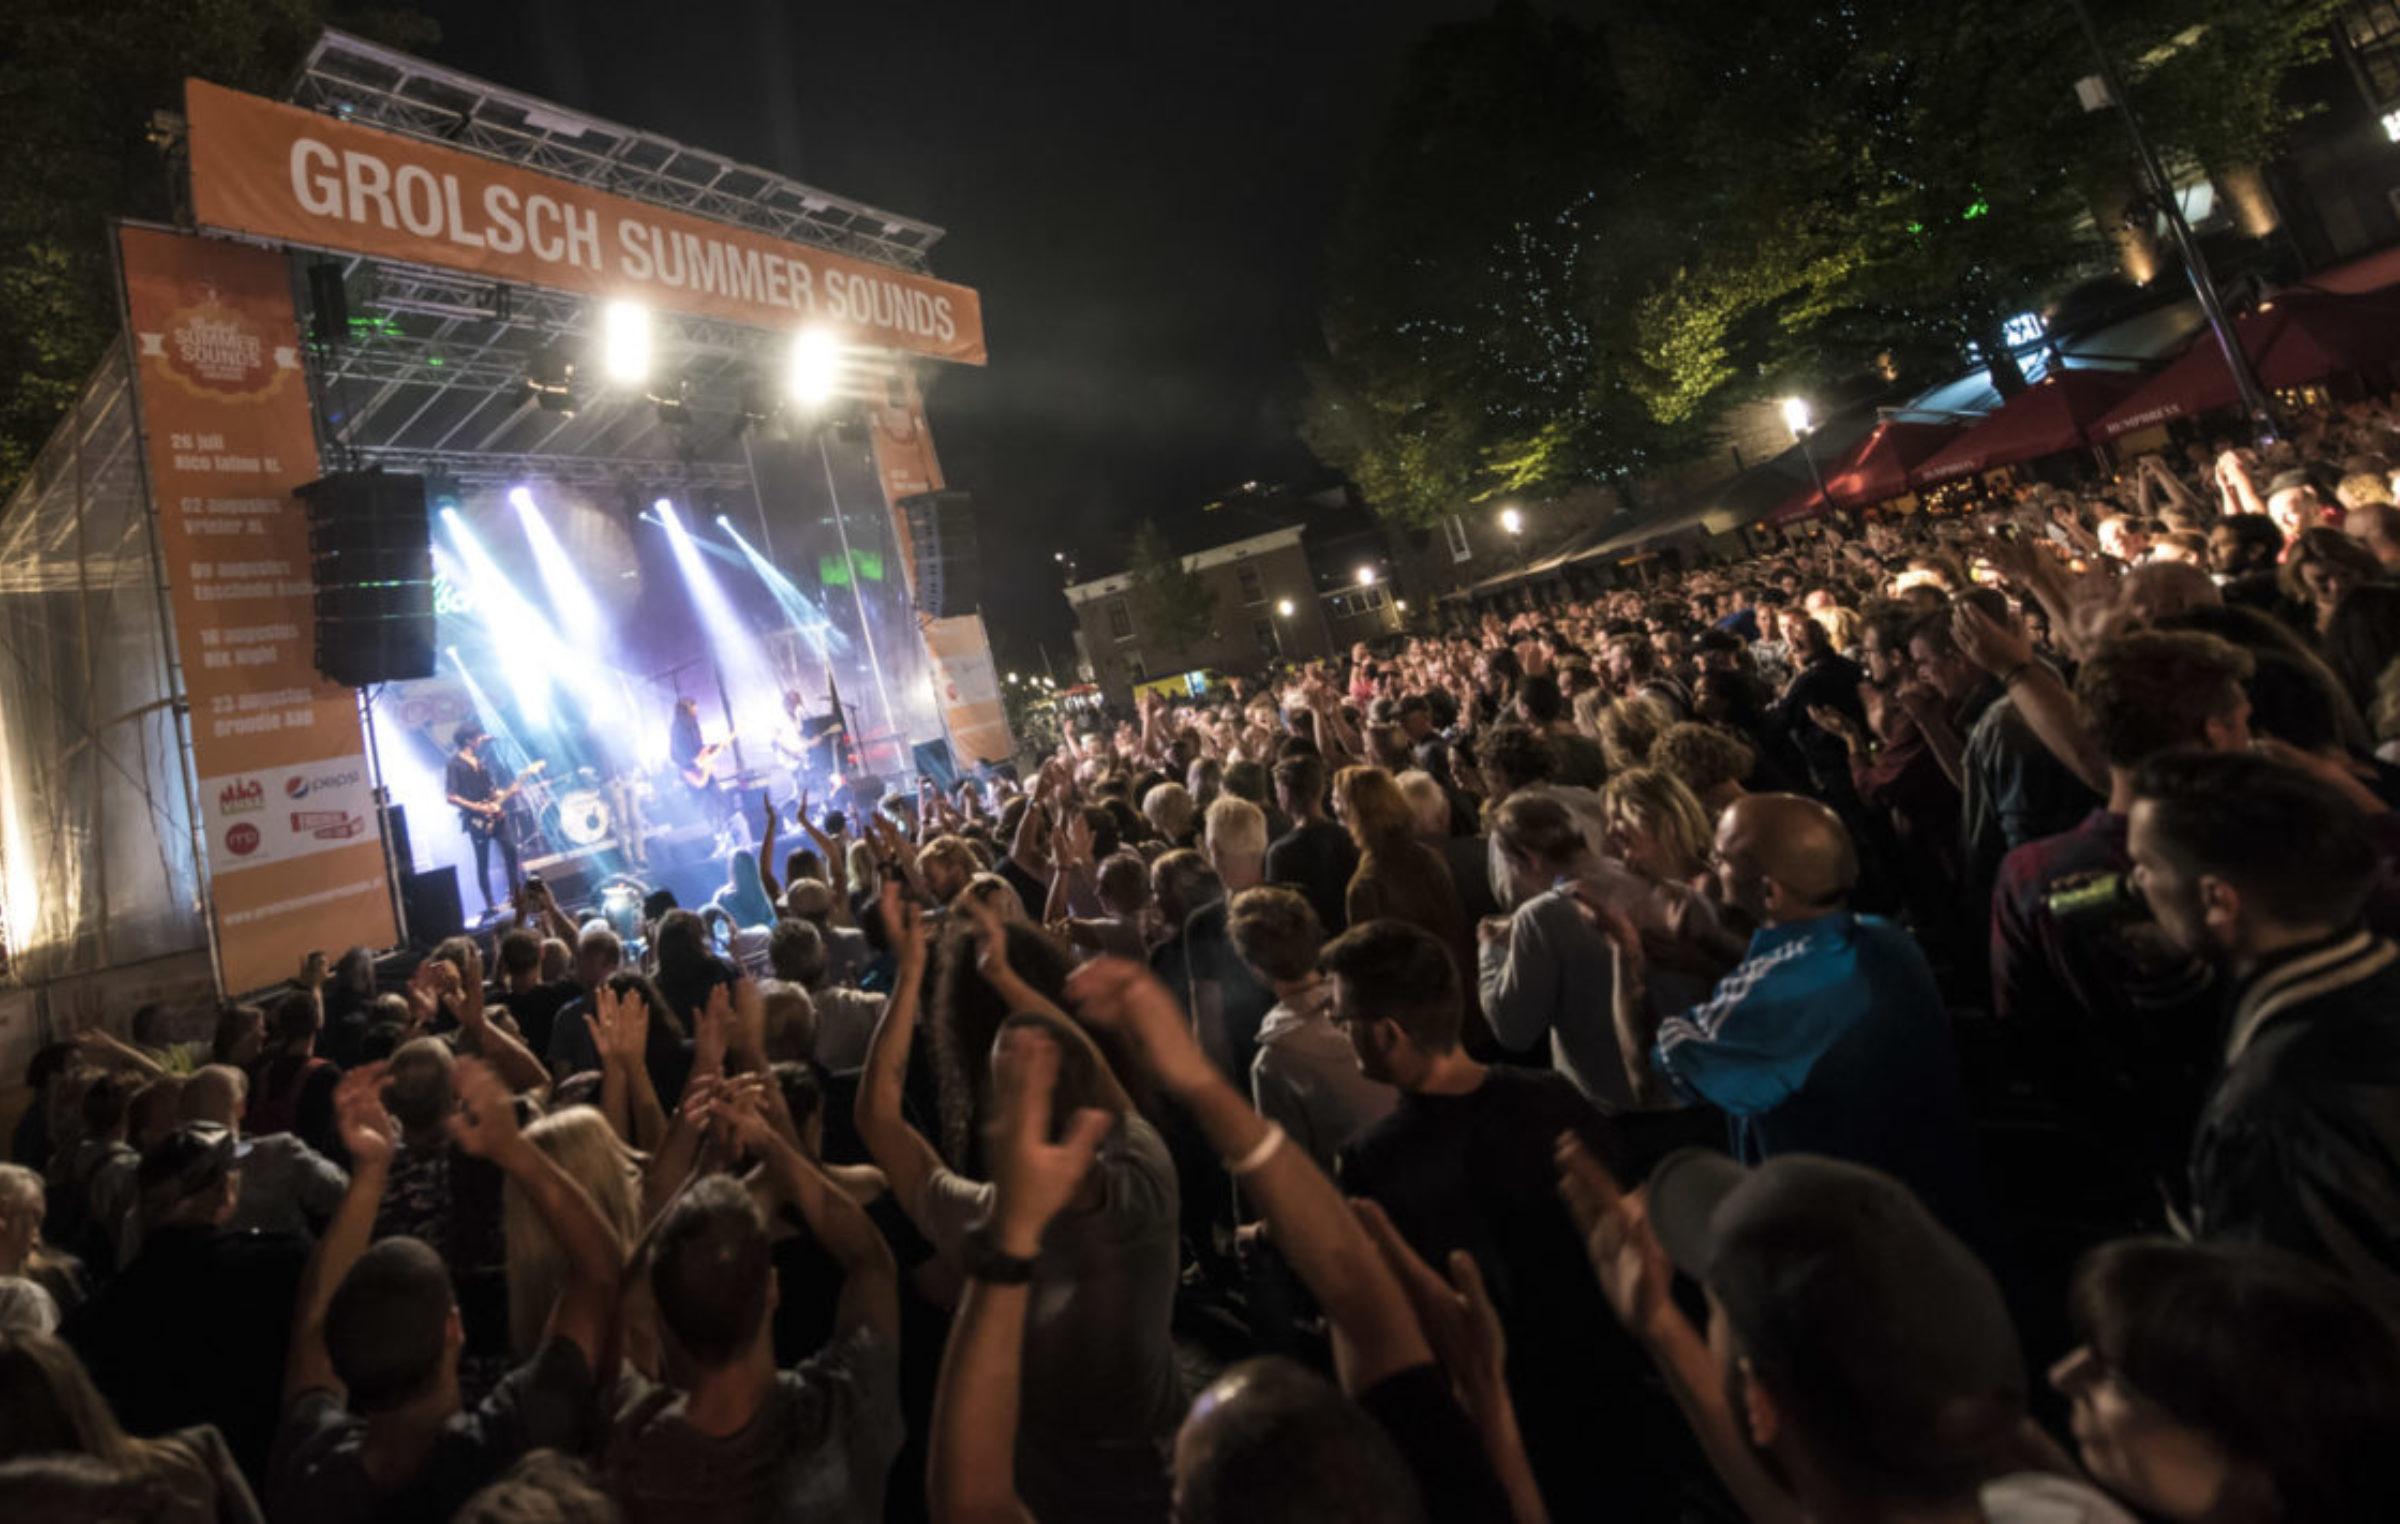 2018 Roy Te Lintelo Grolsch Summer Sounds Enschede Rocks evenementen 14 3768 1578660772 35i1we93h5